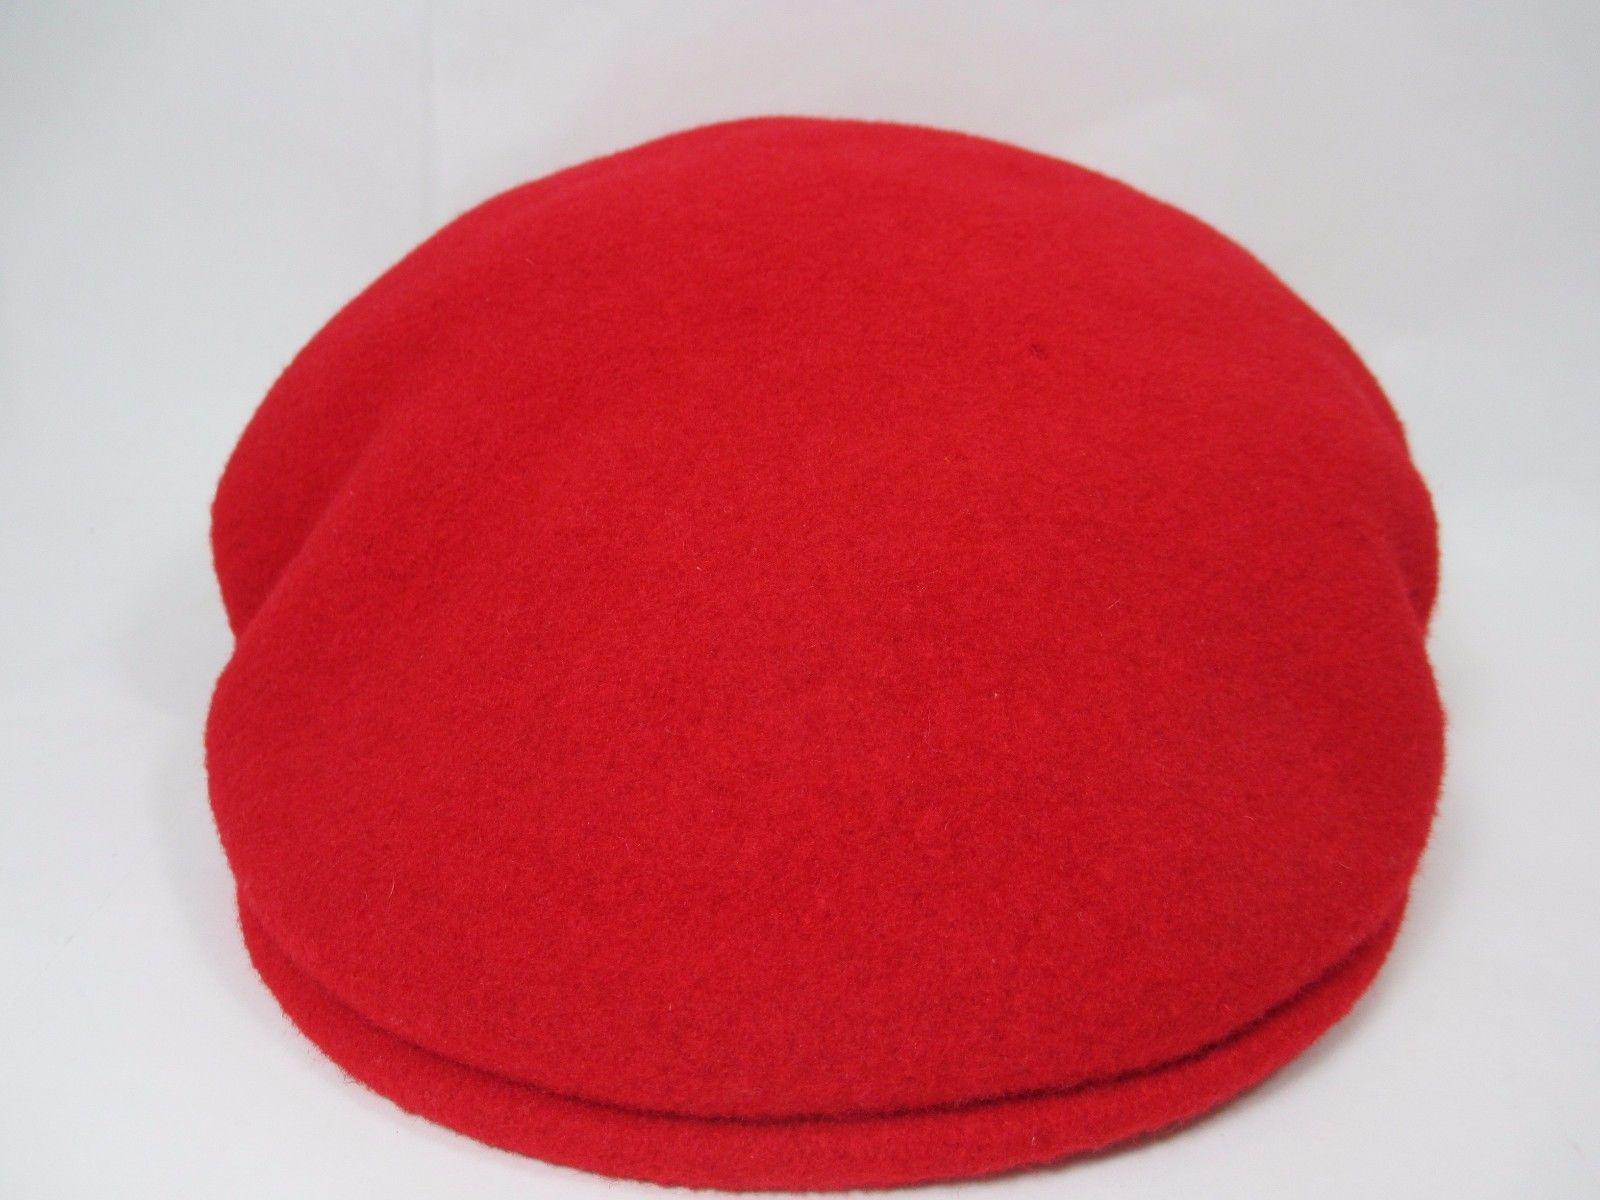 d6b6d039e8c07 Vintage Kangol 100% Pure Virgin Wool Red Cap Newsboys Cabbie Hat Size S  England